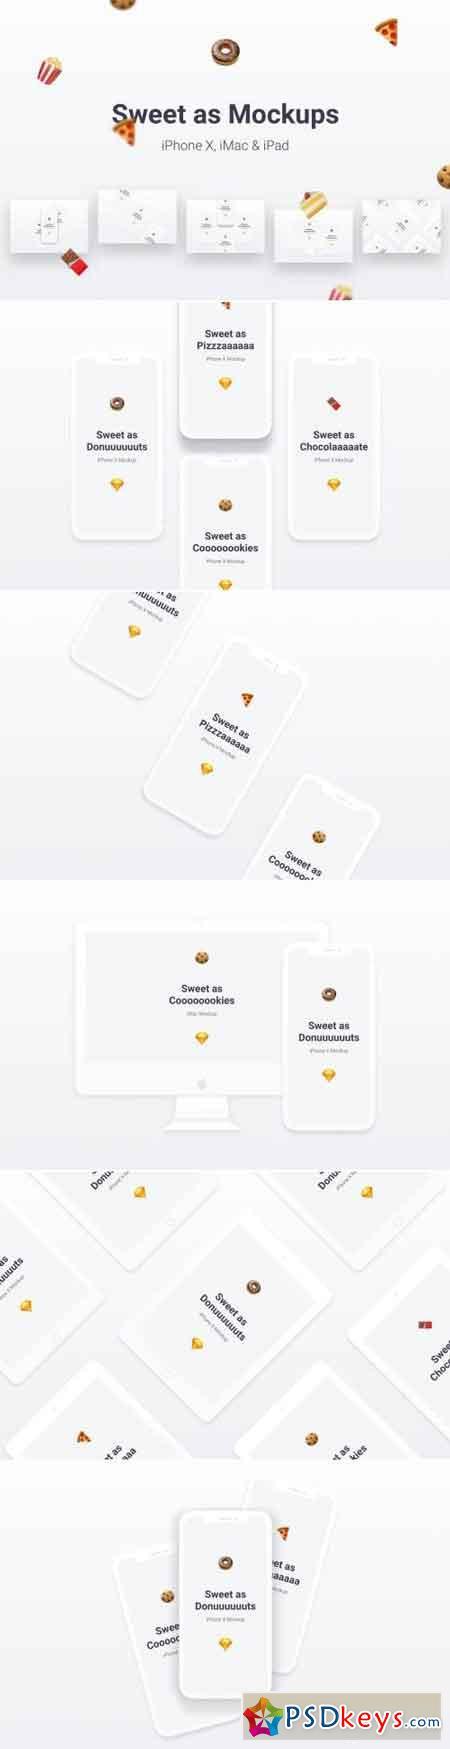 Sweet as Mockups - Apple iPhone X, iMac & iPad Air